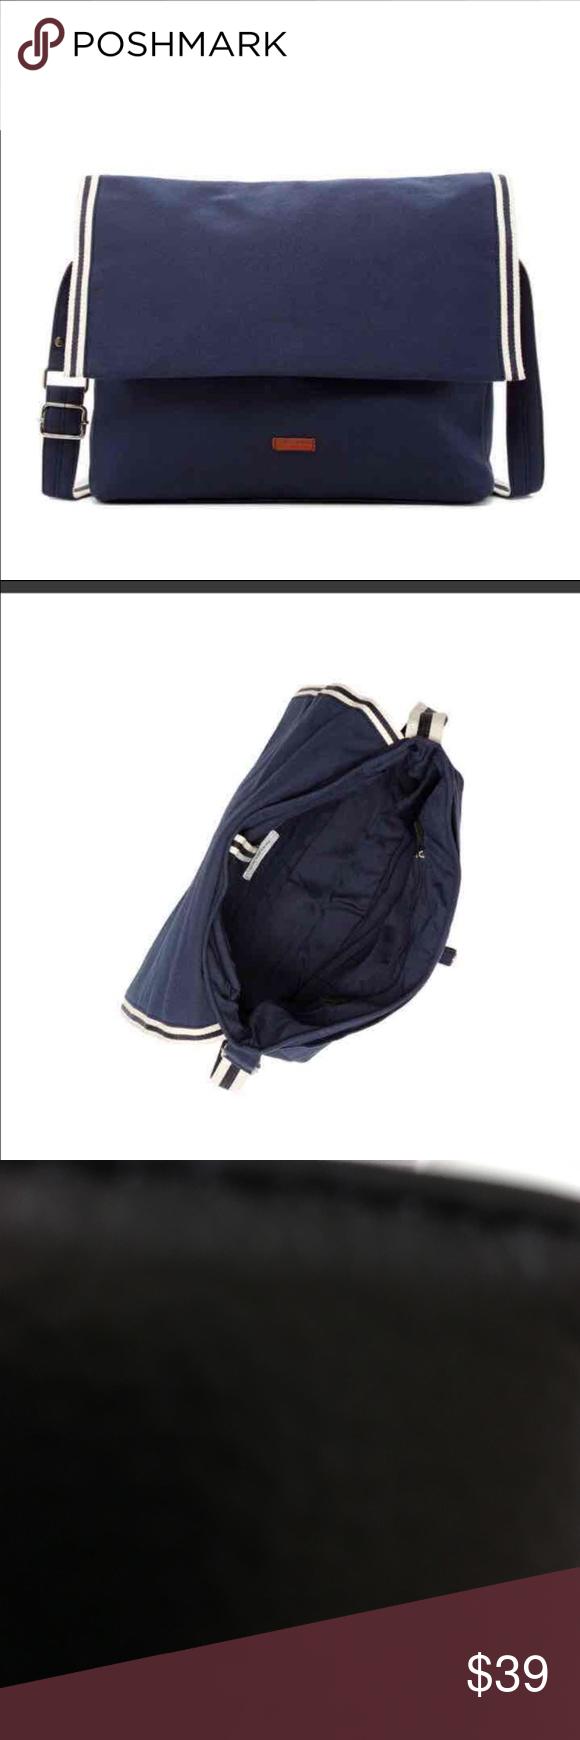 Ben Sherman Tour Canvas Messenger bag Ben Sherman Tour Canvas Messenger bag. black color. Ben Sherman Bags Laptop Bags